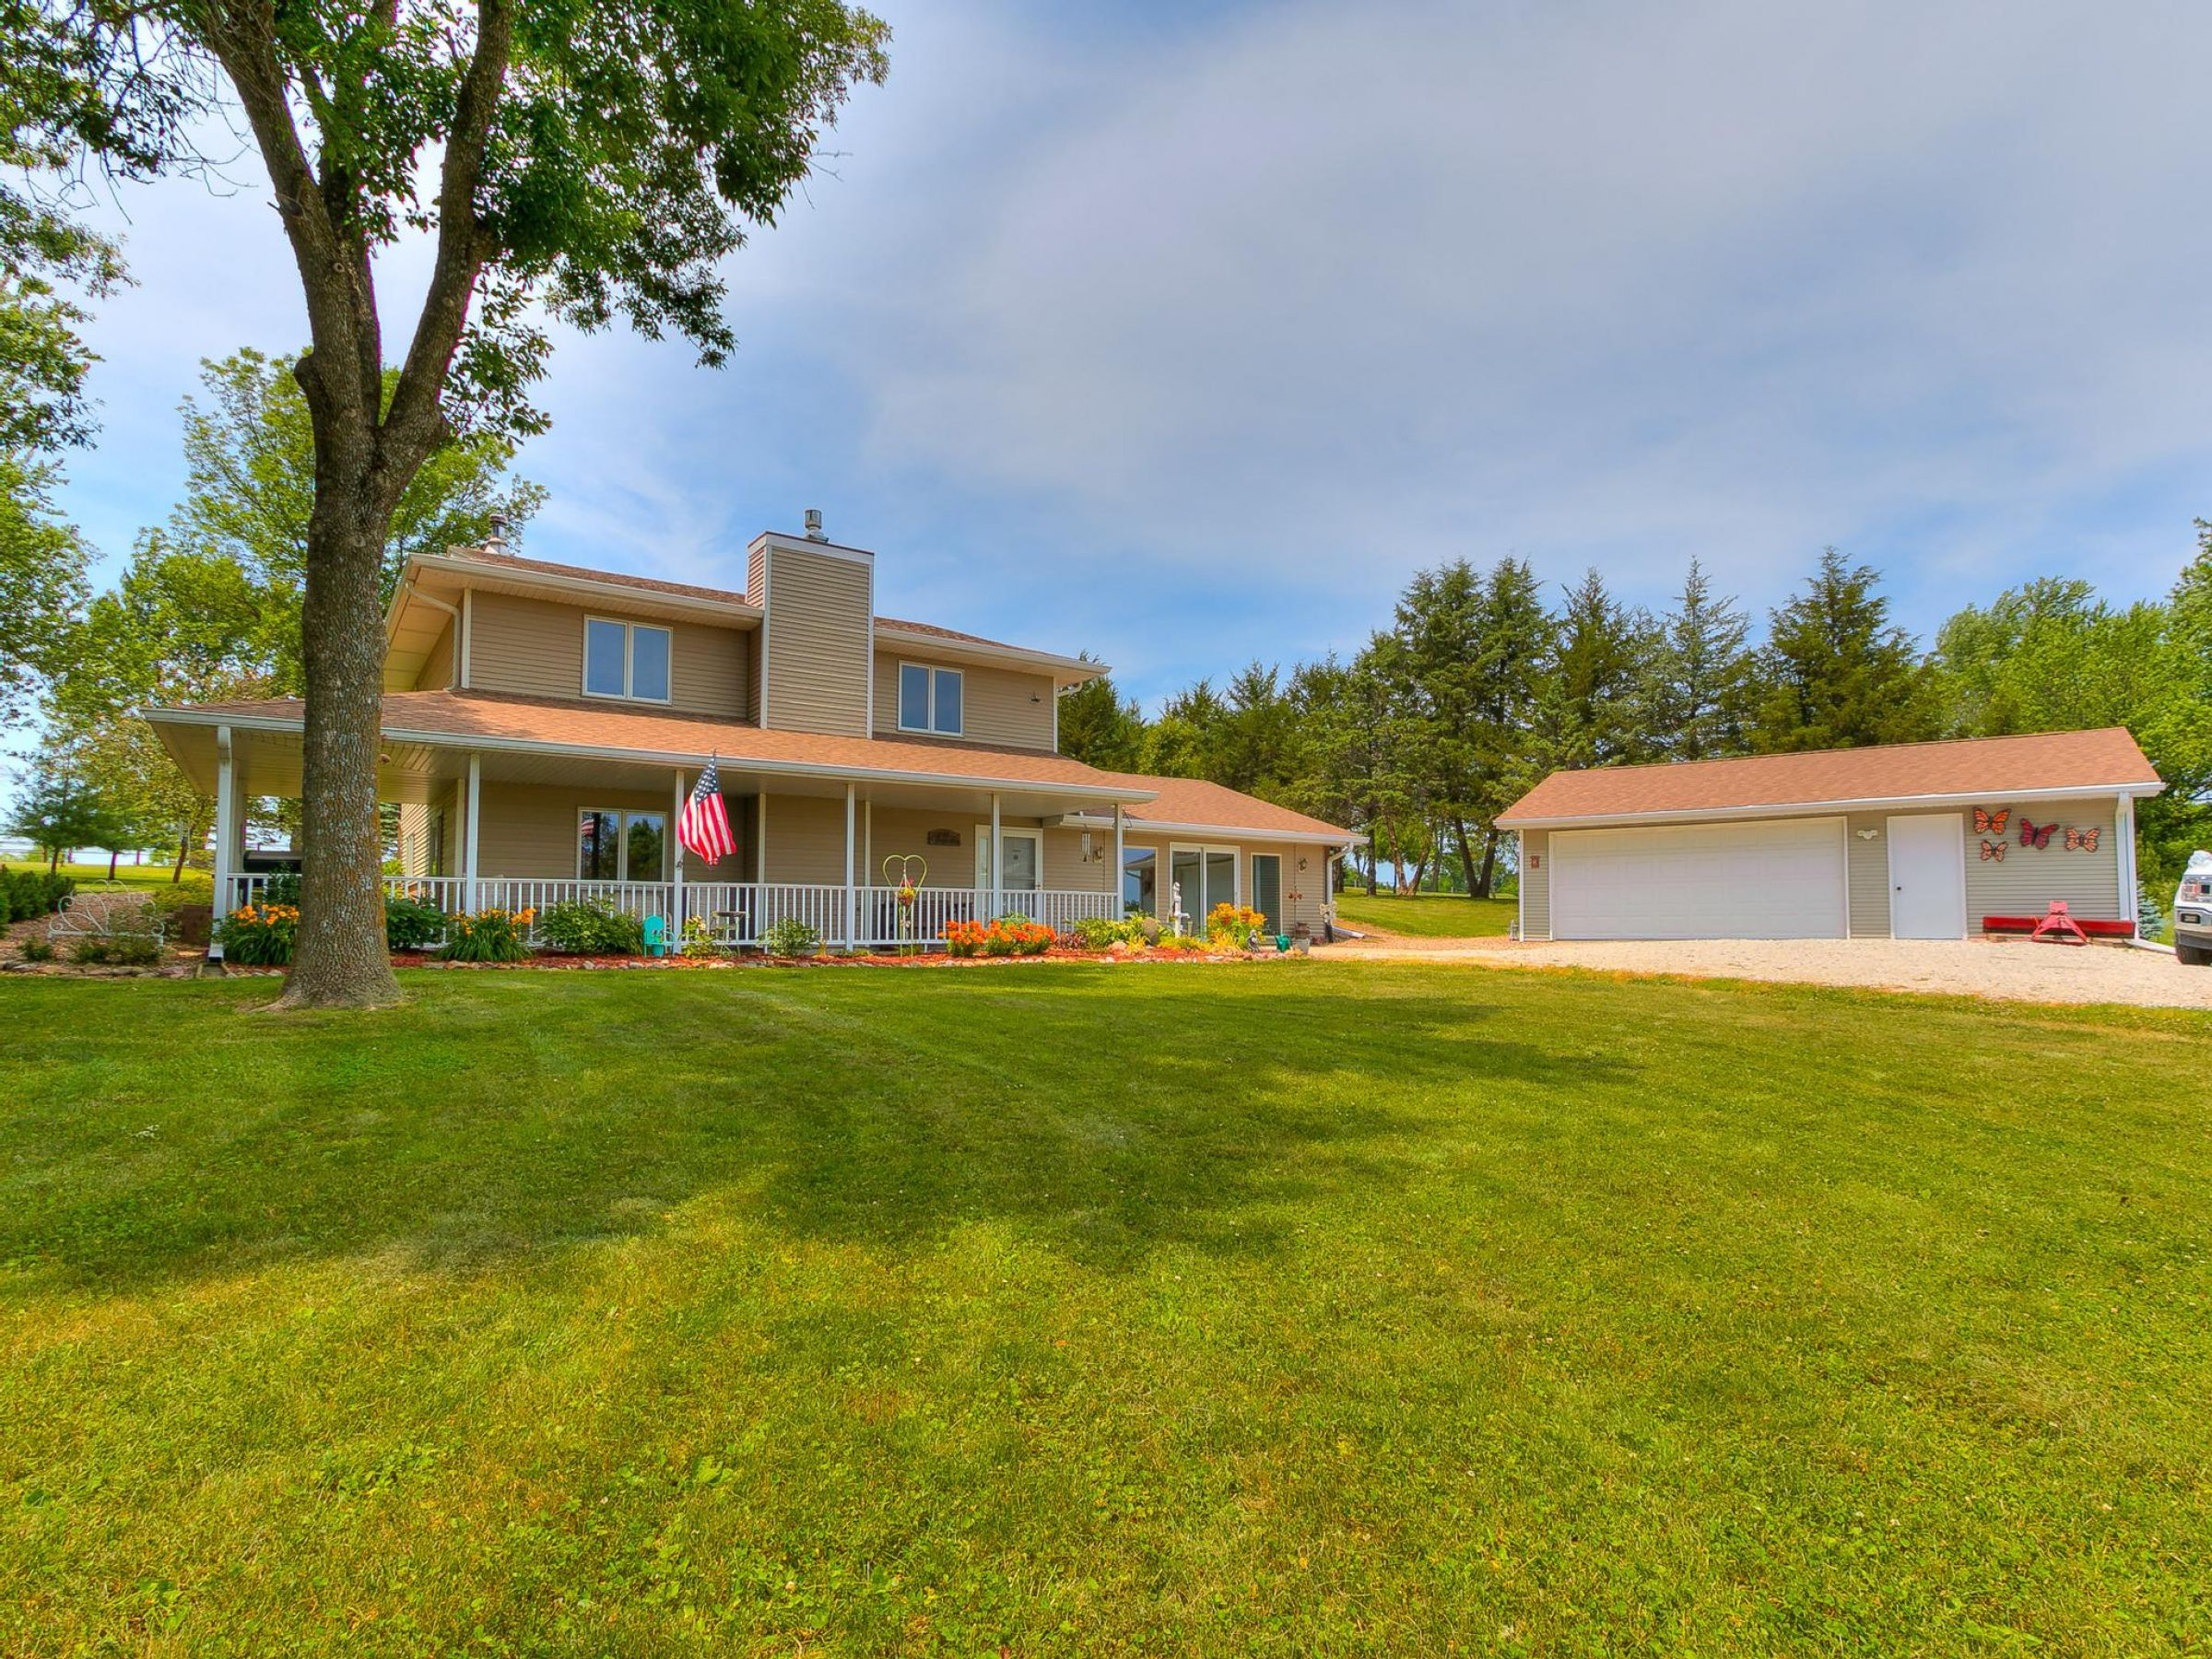 residential-warren-county-iowa-3-acres-listing-number-15593-3-2021-06-18-154522.jpg